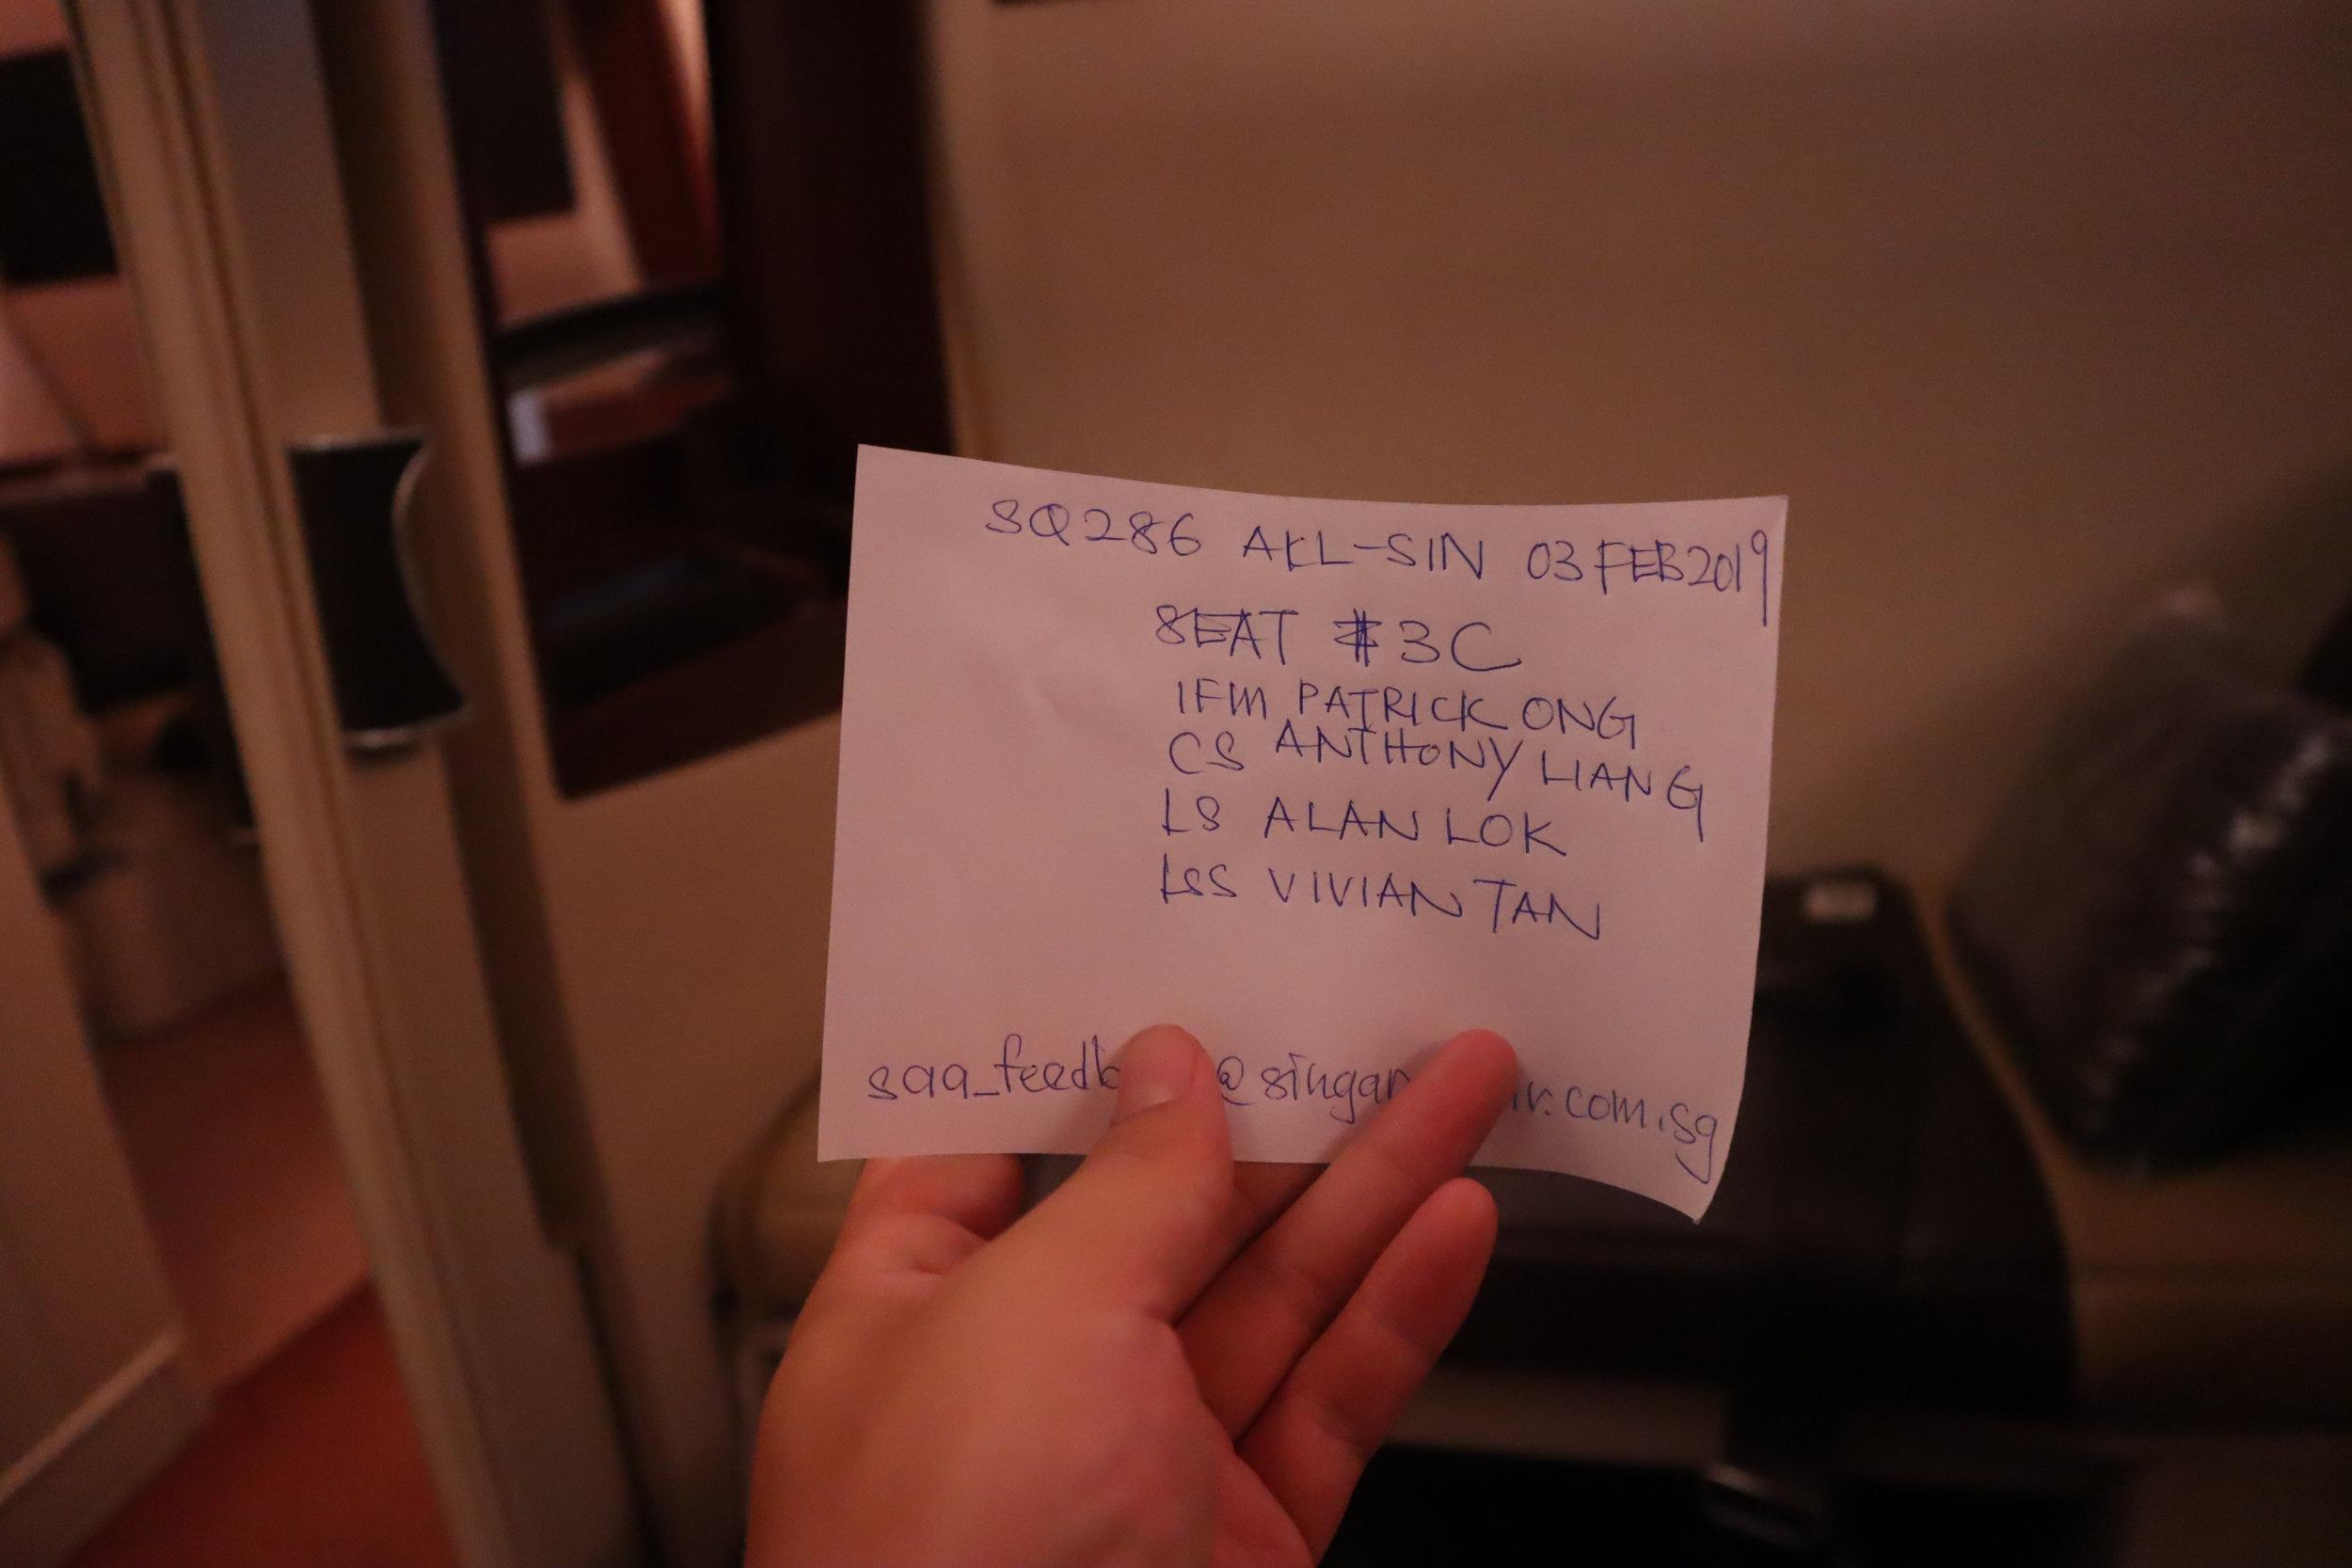 Singapore Airlines Suites Class – Comment card